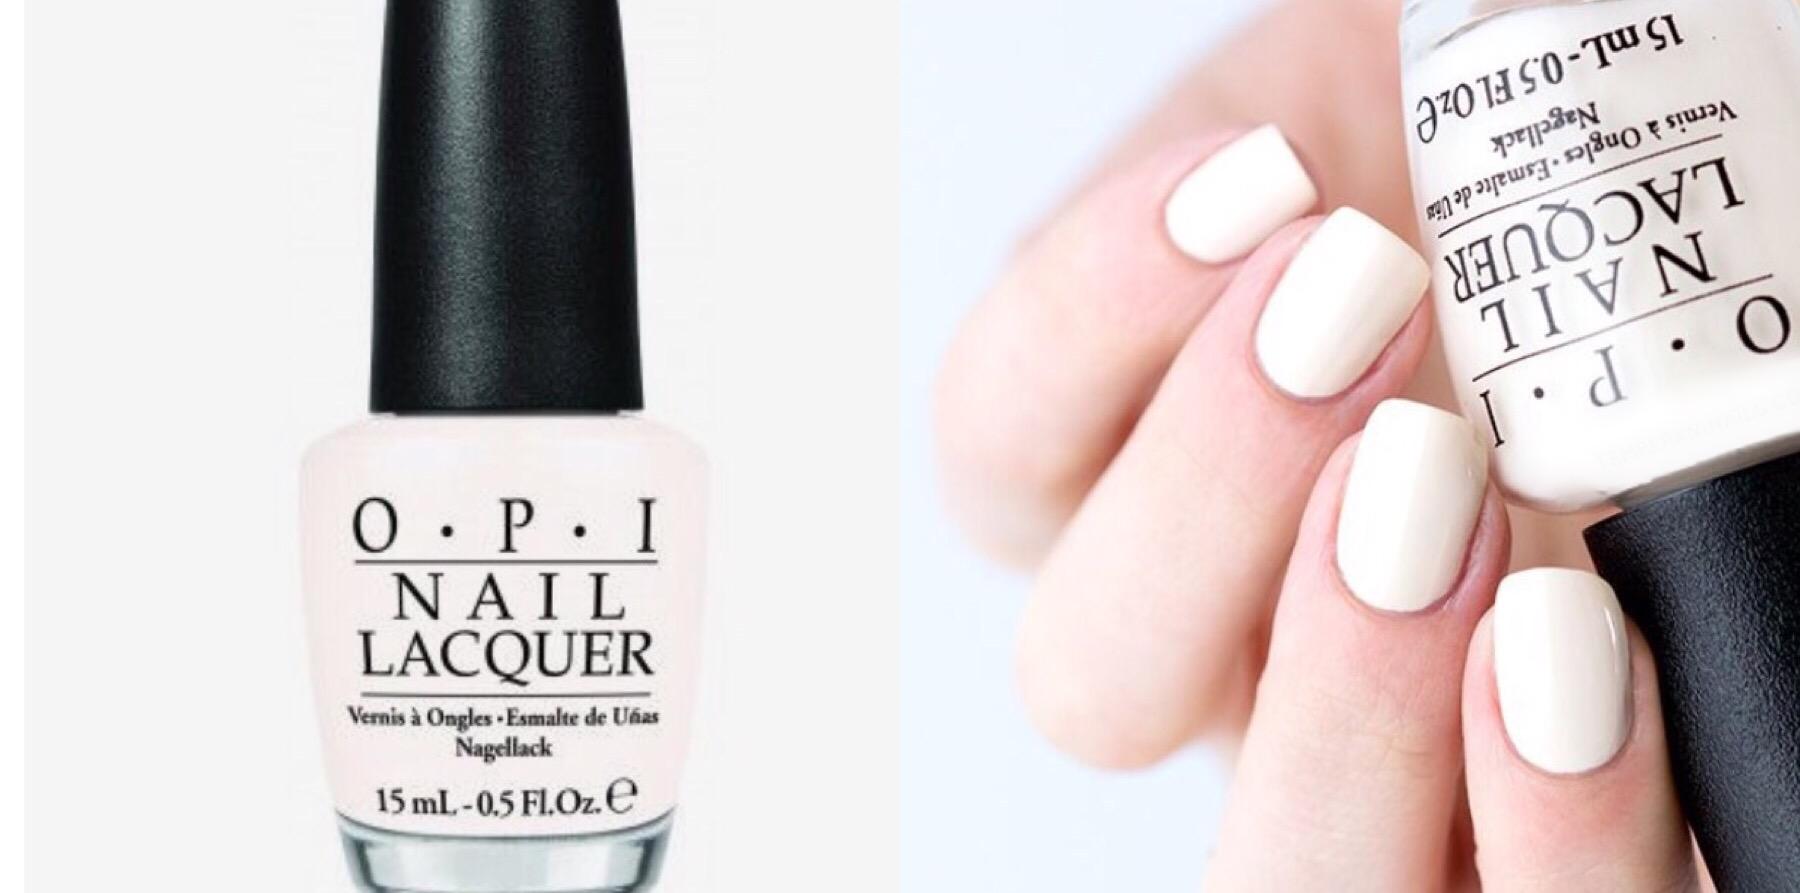 creamy white nails